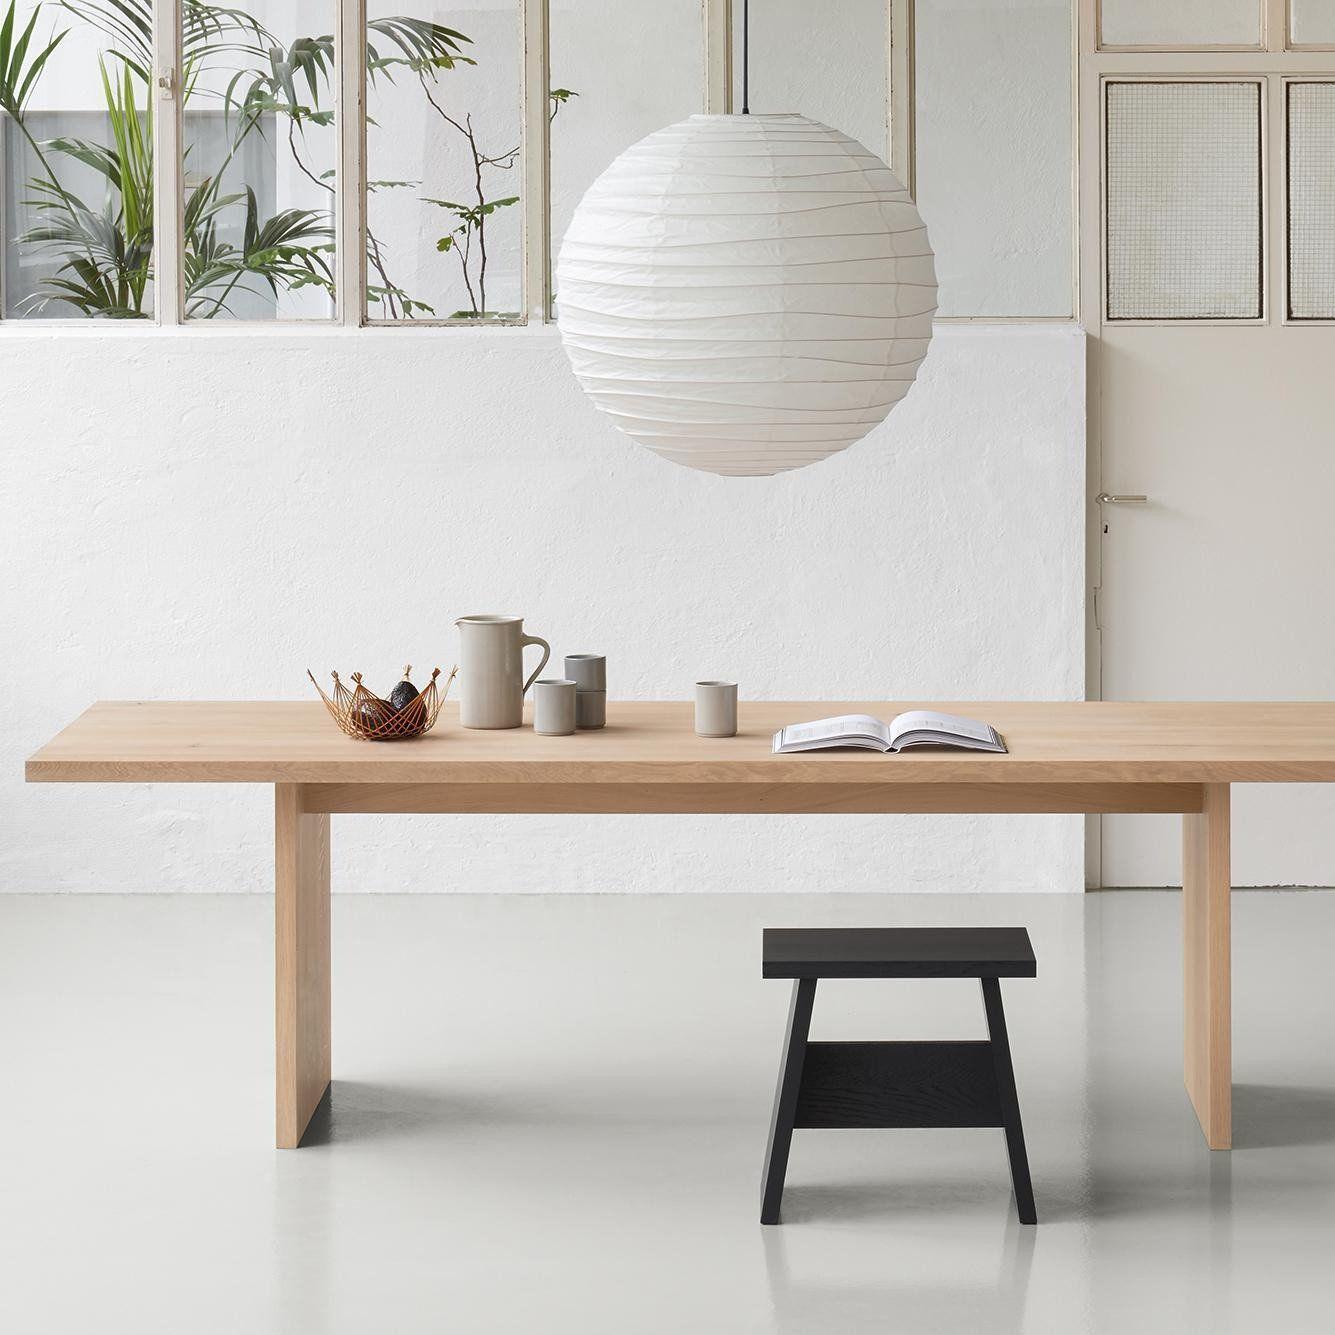 E15 Ta23 Ashida Dining Table Furniture Interior Dining Table